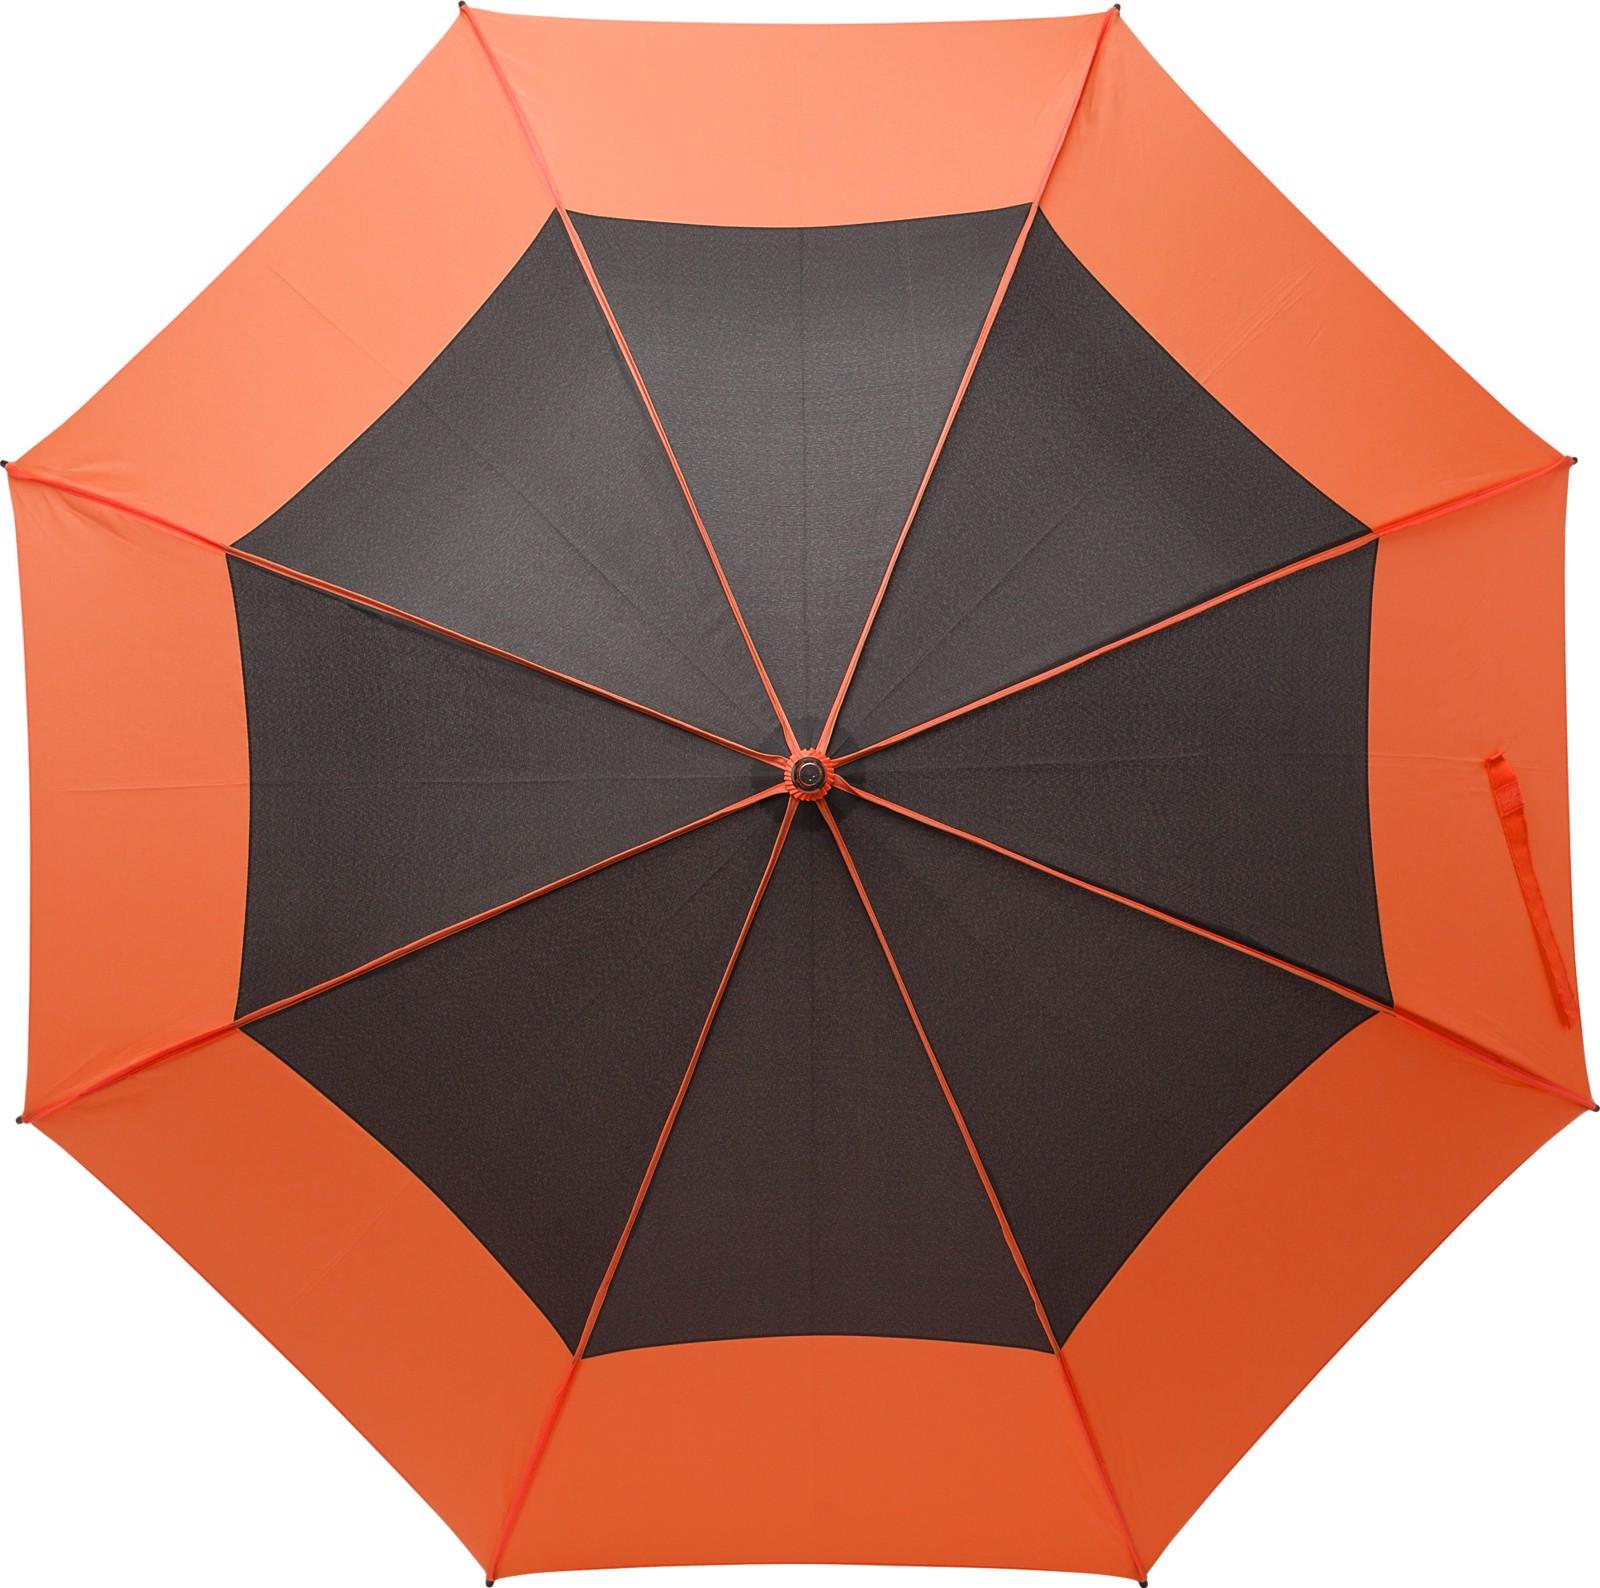 Pongee (190T) storm umbrella - Orange